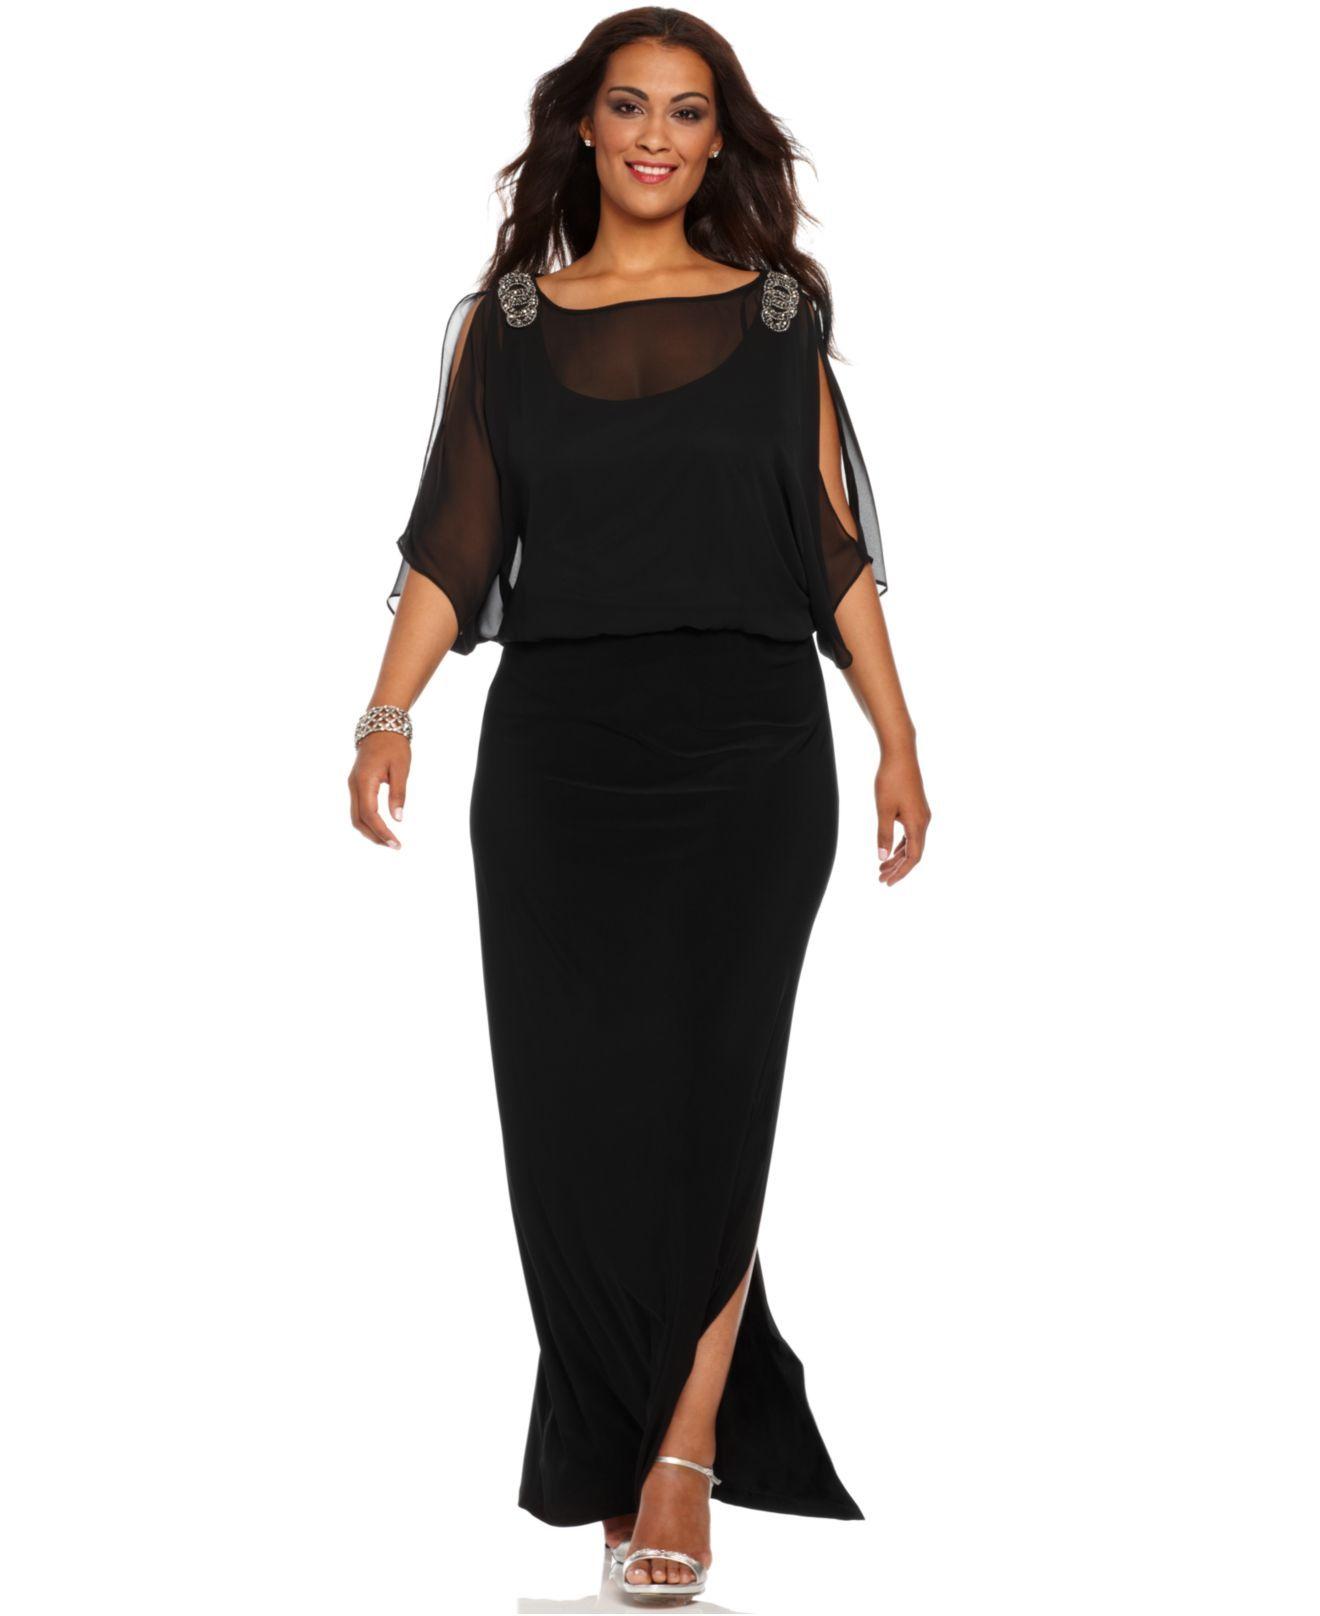 Xscape Plus Size Dress, Short Split Sleeve Beaded Evening